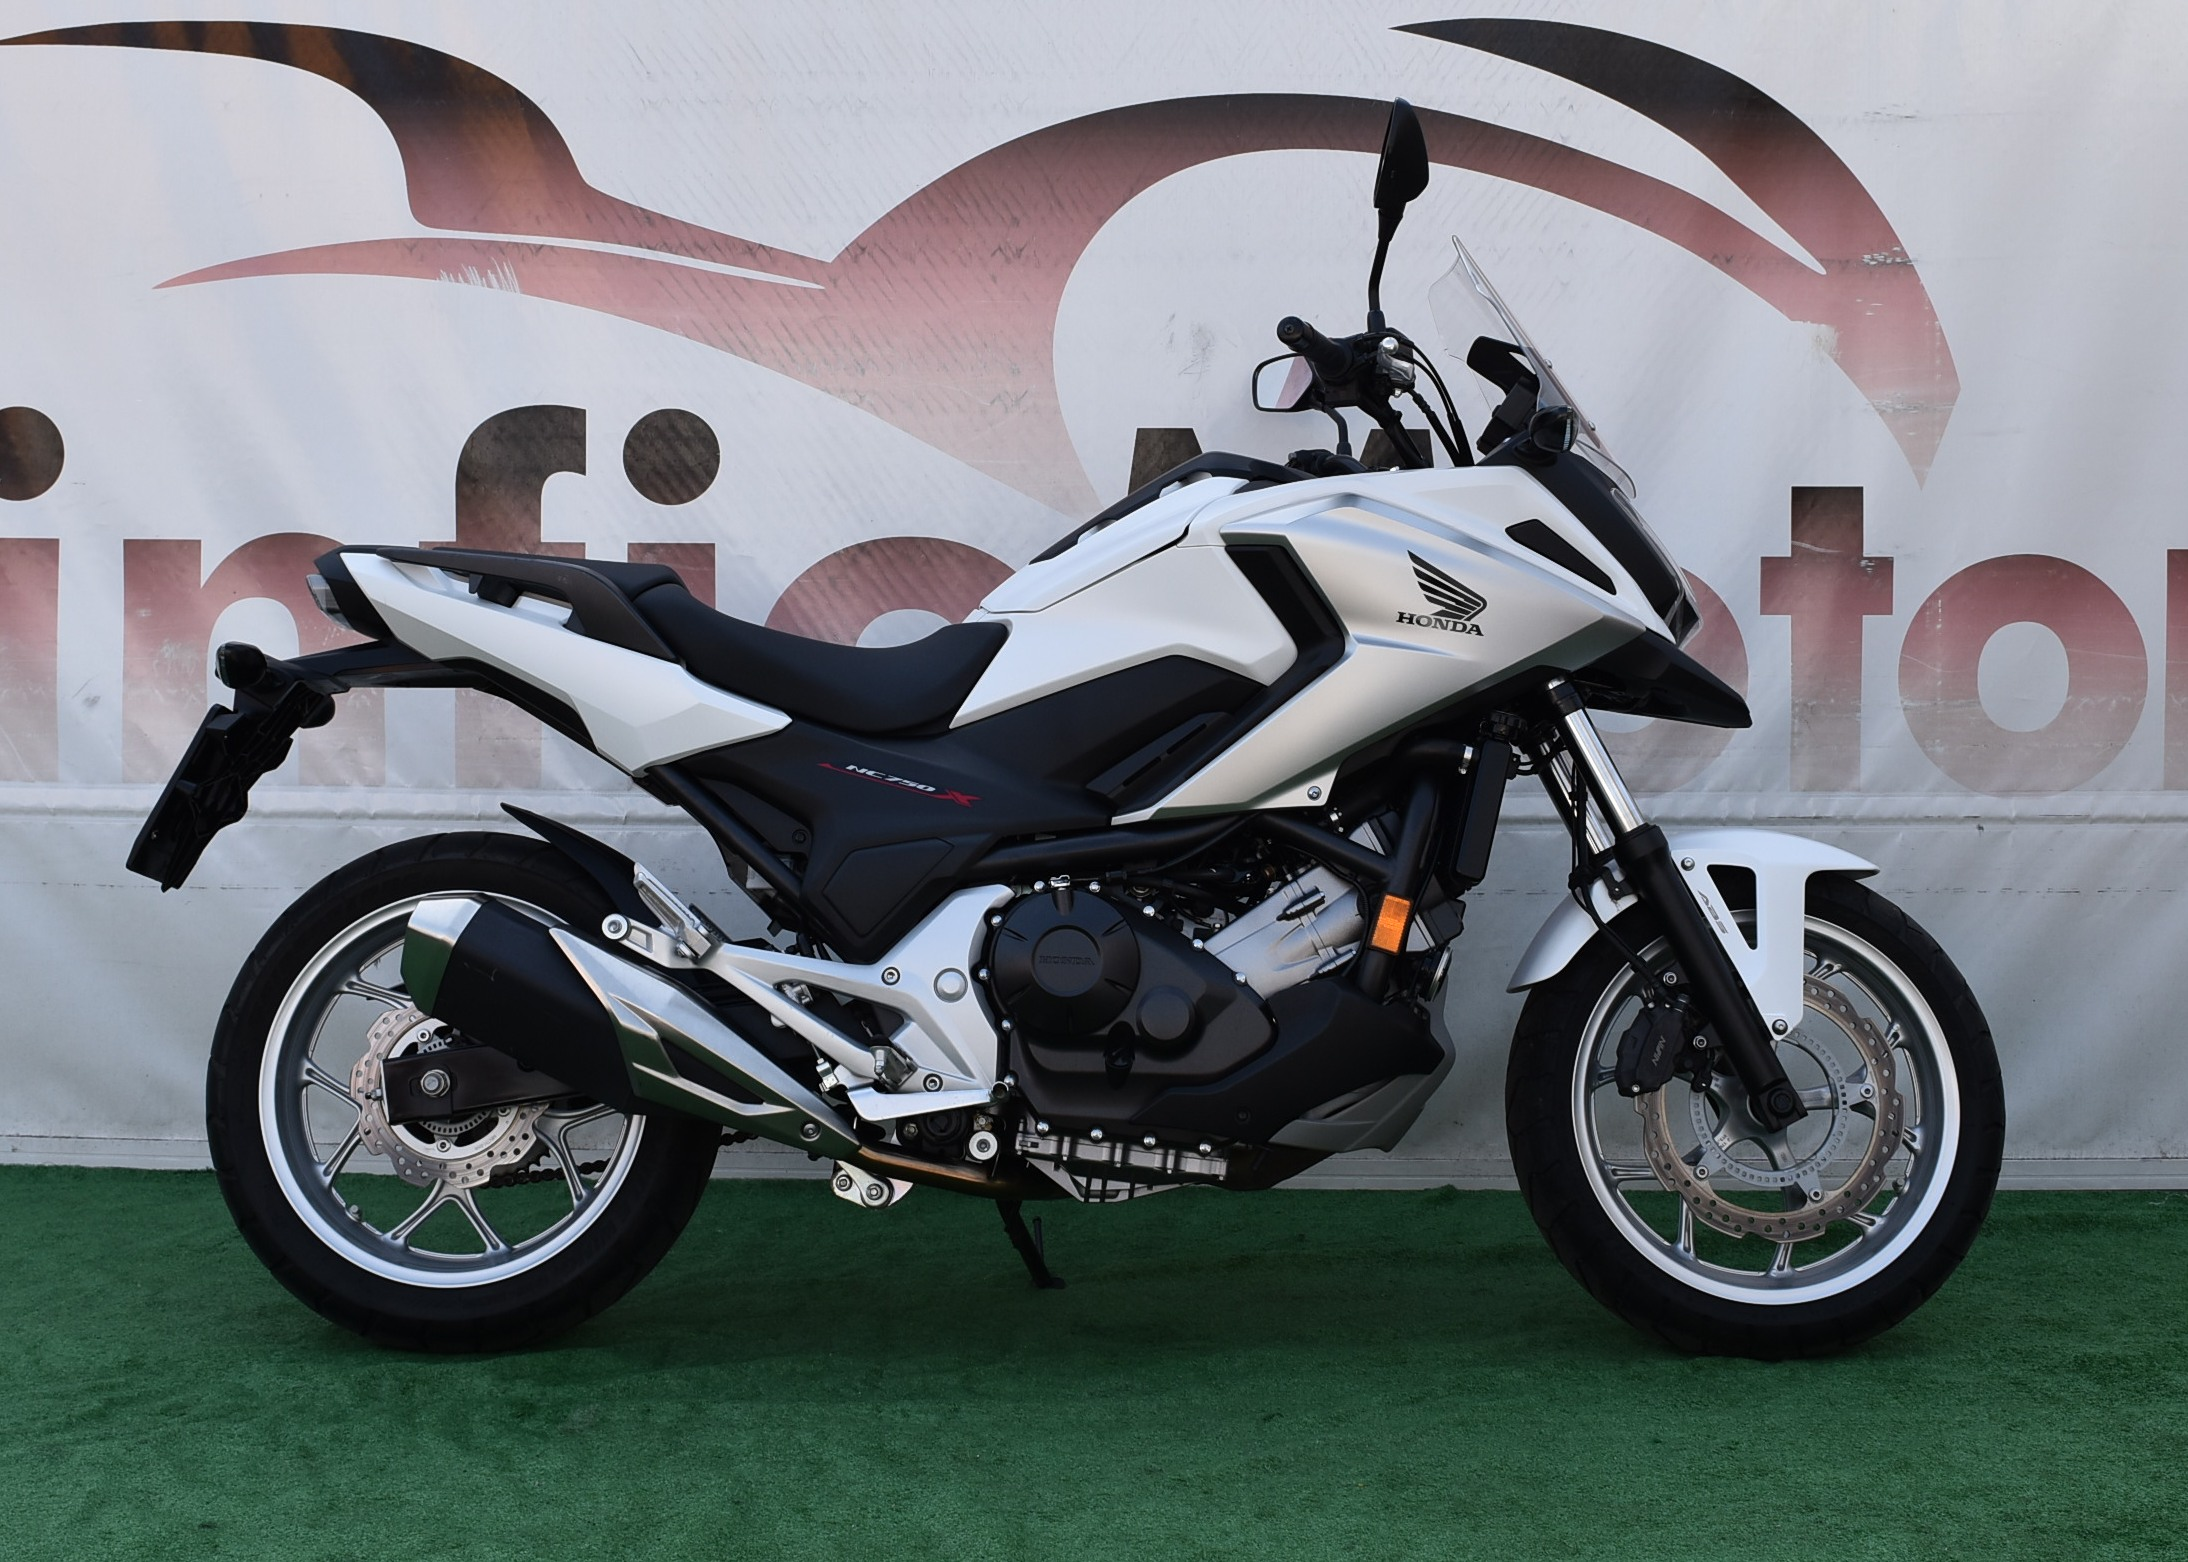 HONDA NC 750 X ABS – 2017 WHITE